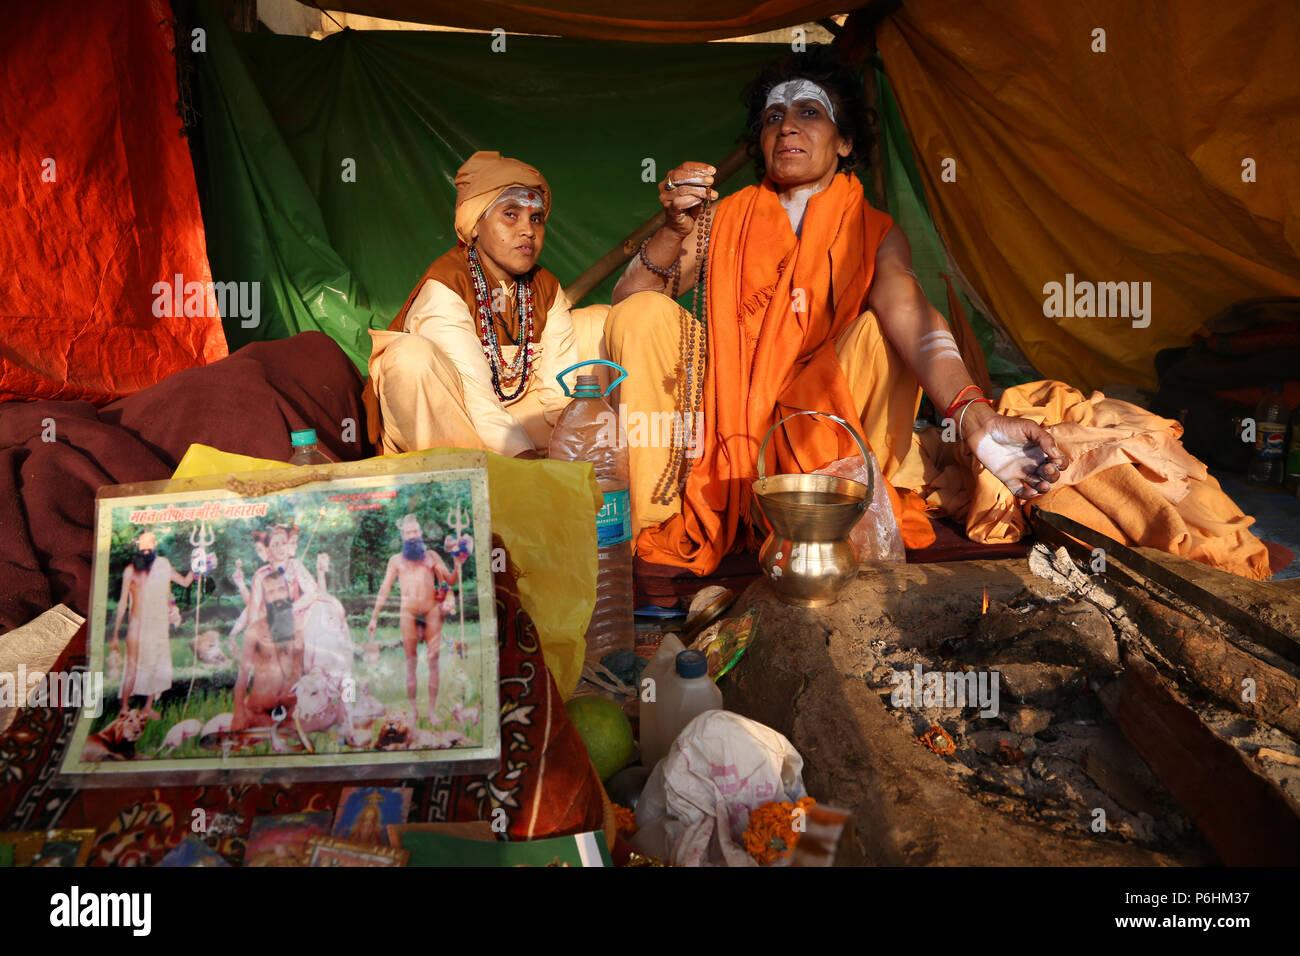 Local woman guru satvi Maha Kumbh mela 2013 in Allahabad , India - Stock Image